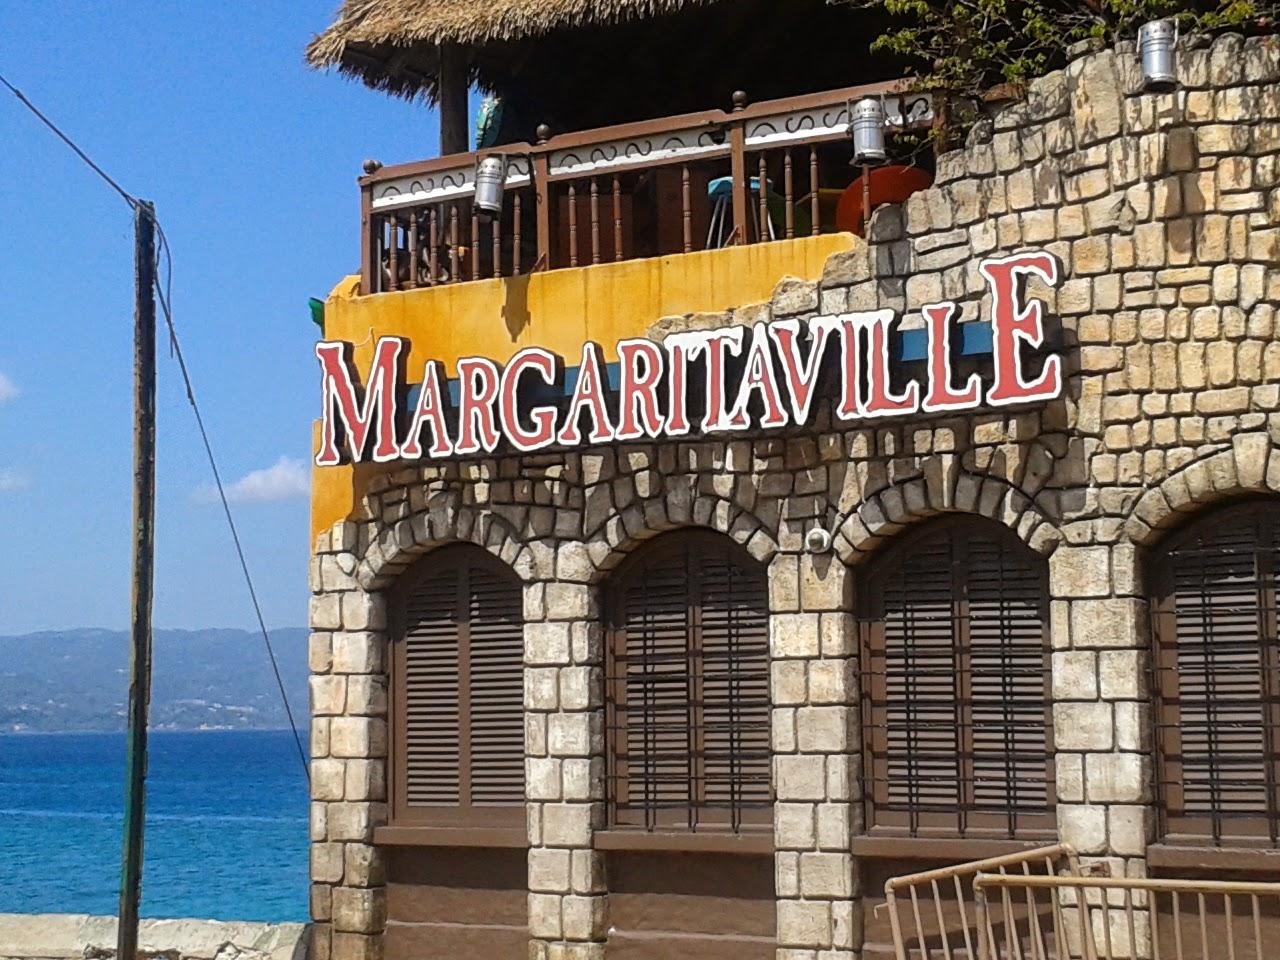 margaritaville, Montego Bay, Jamaica